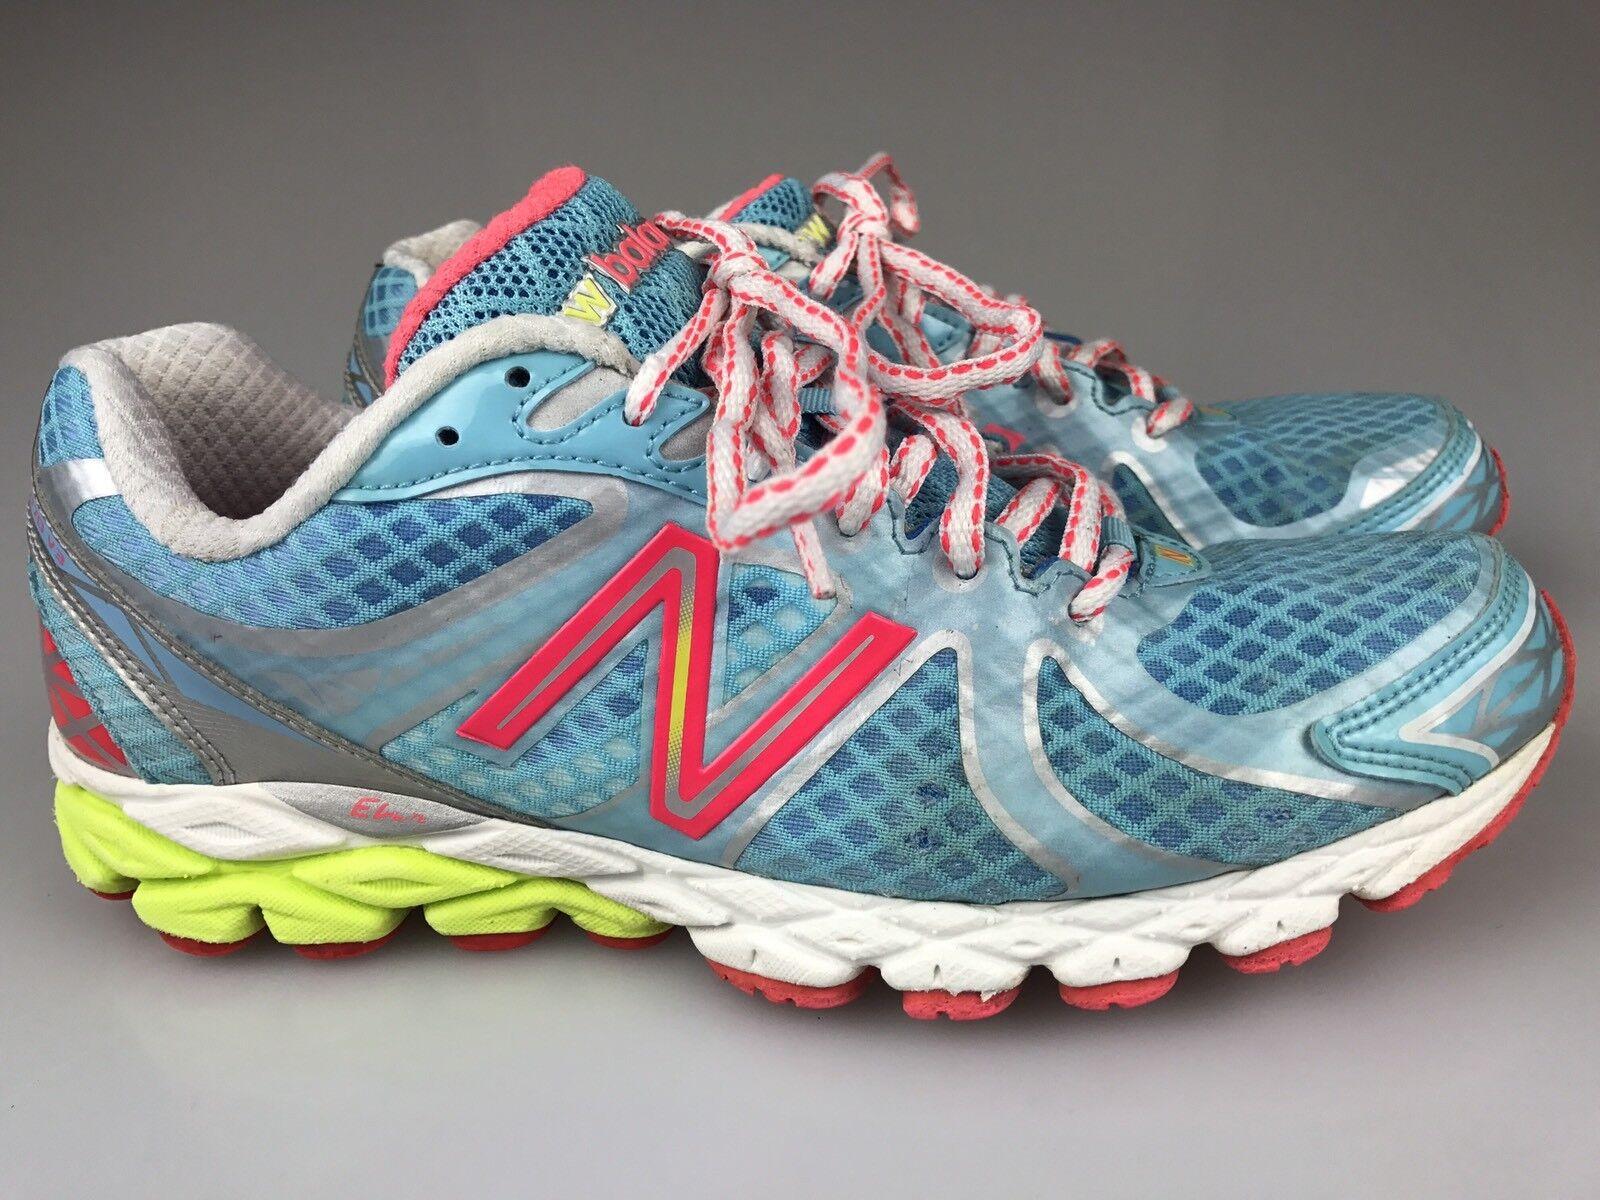 New Balance Womens 870 V3 Mesh Revlite Pink Running Cross Training shoes 6.5 B